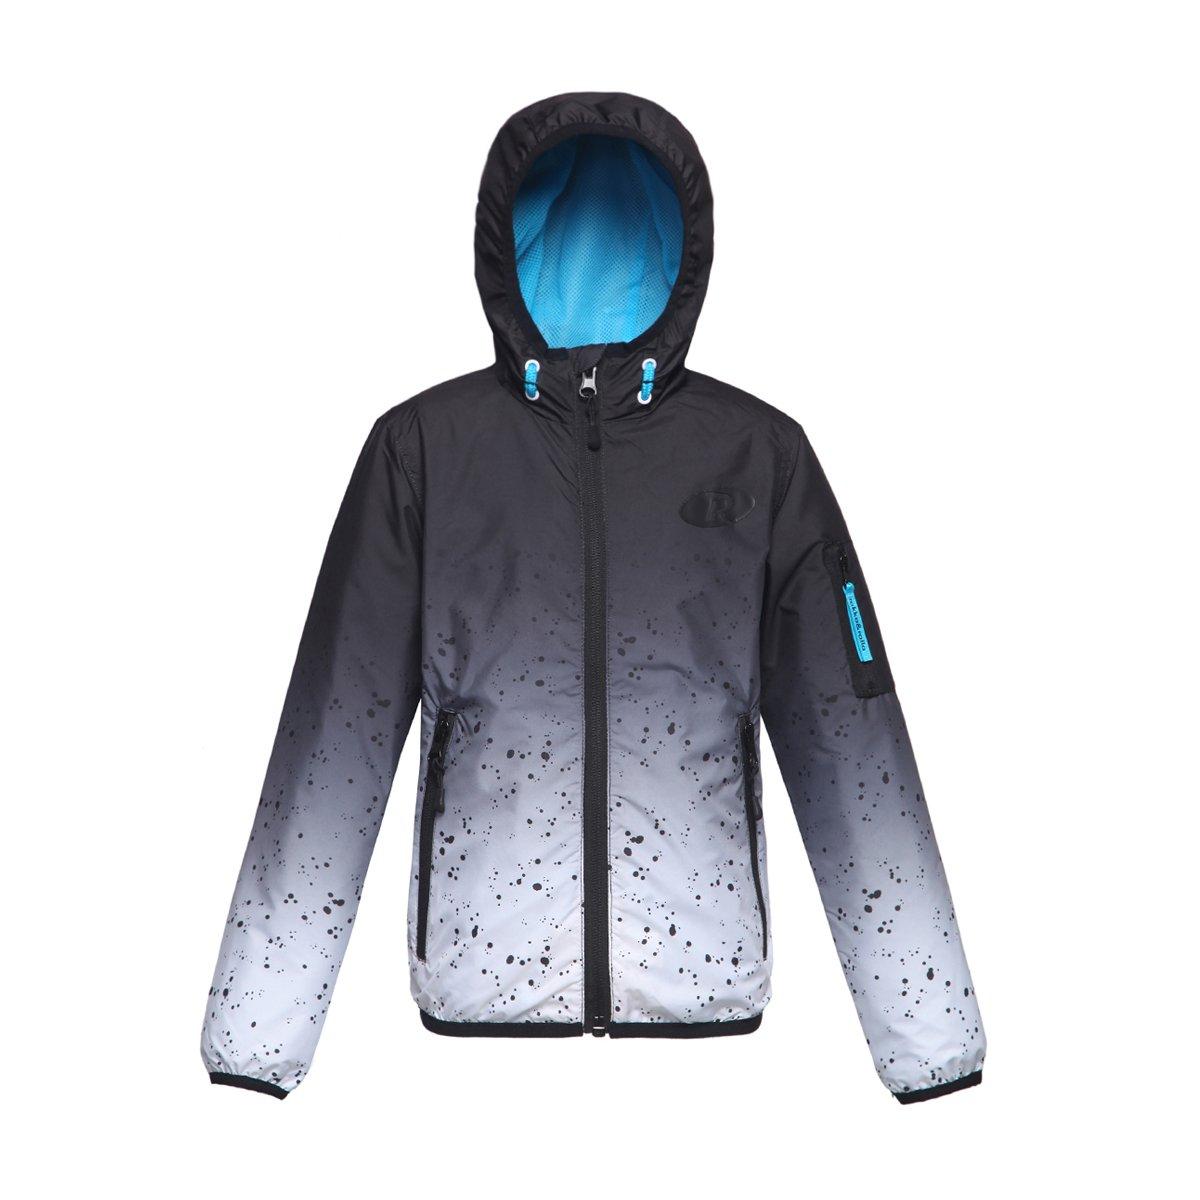 Rokka Rolla Boys' Lightweight Water Resistant Zip Up Hooded Windbreaker Jacket